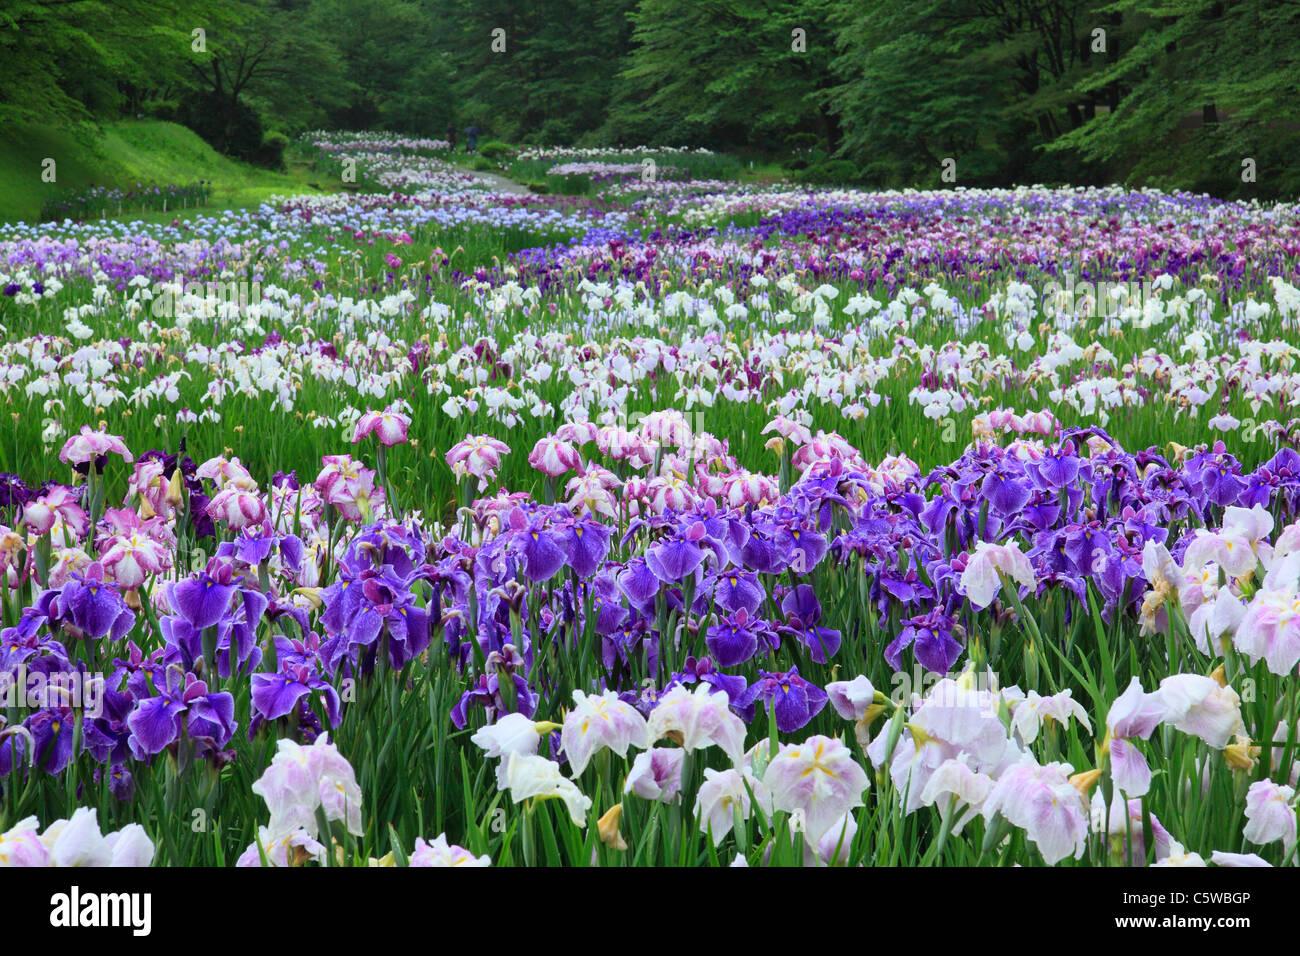 Iris park stock photos iris park stock images alamy iris flower garden of ijimino park shibata niigata japan stock image izmirmasajfo